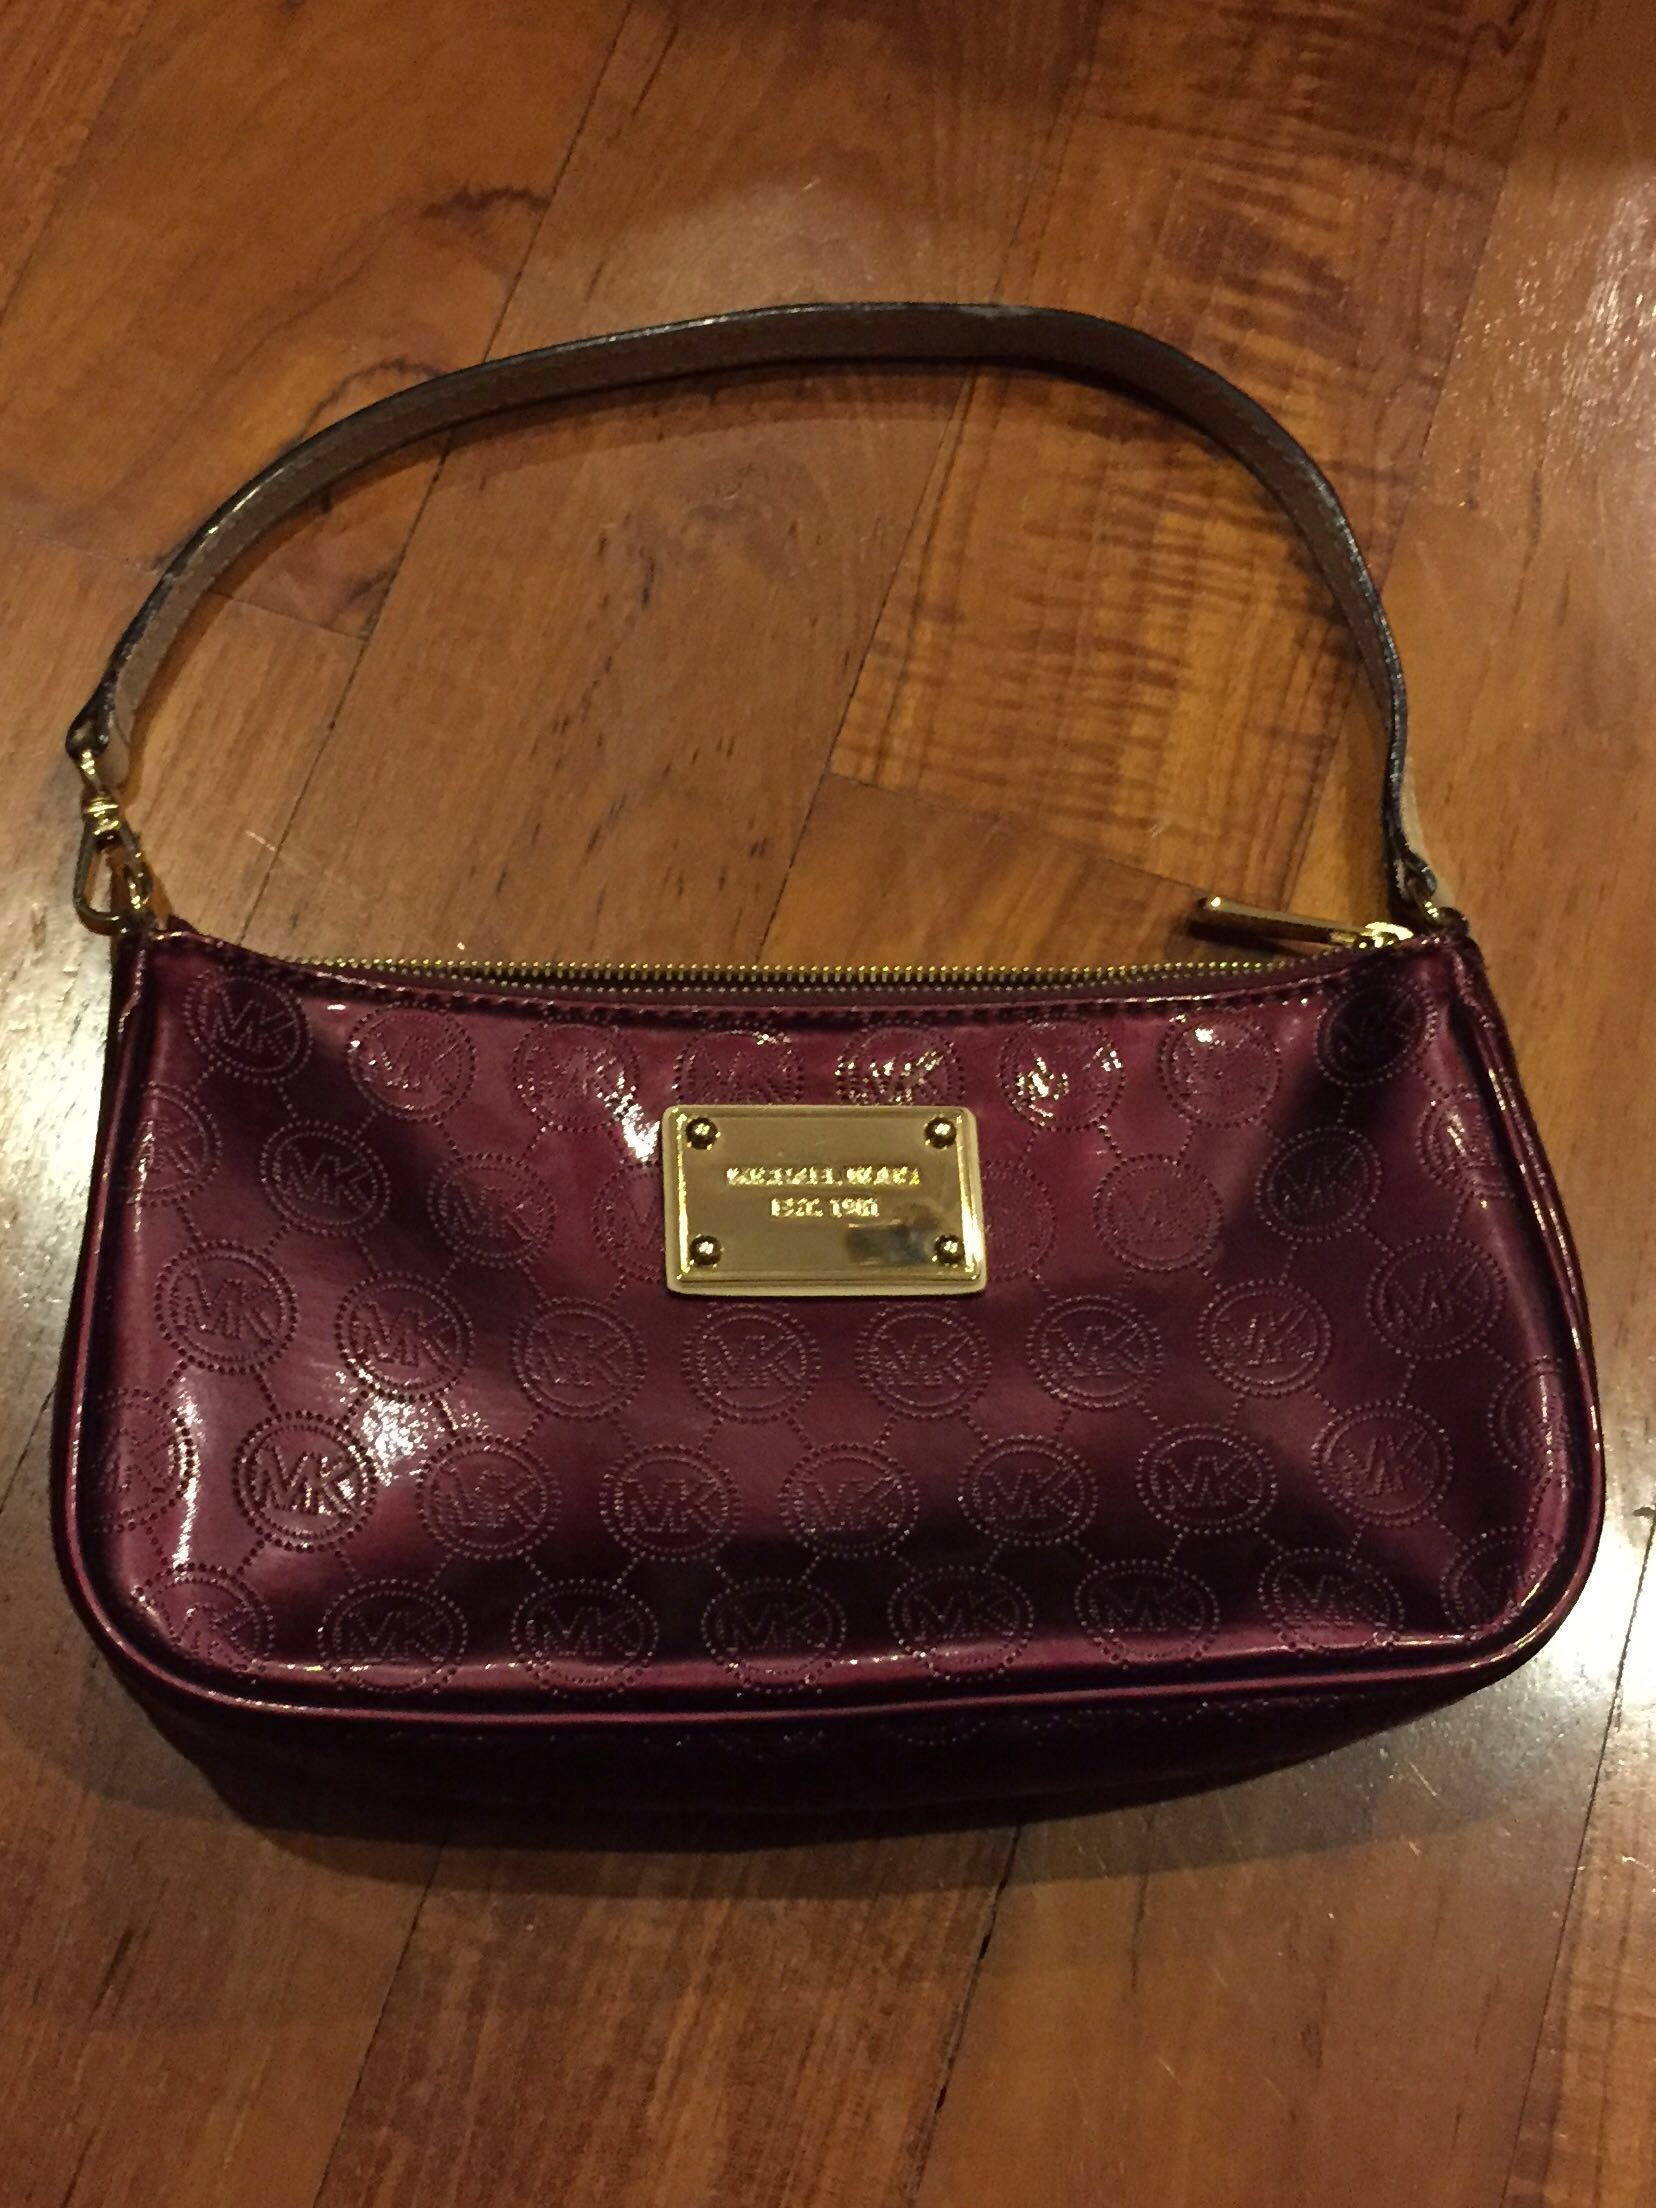 43f401043f5f Michael Kors Bordeaux Red Mini Clutch Bag, Luxury, Bags & Wallets ...